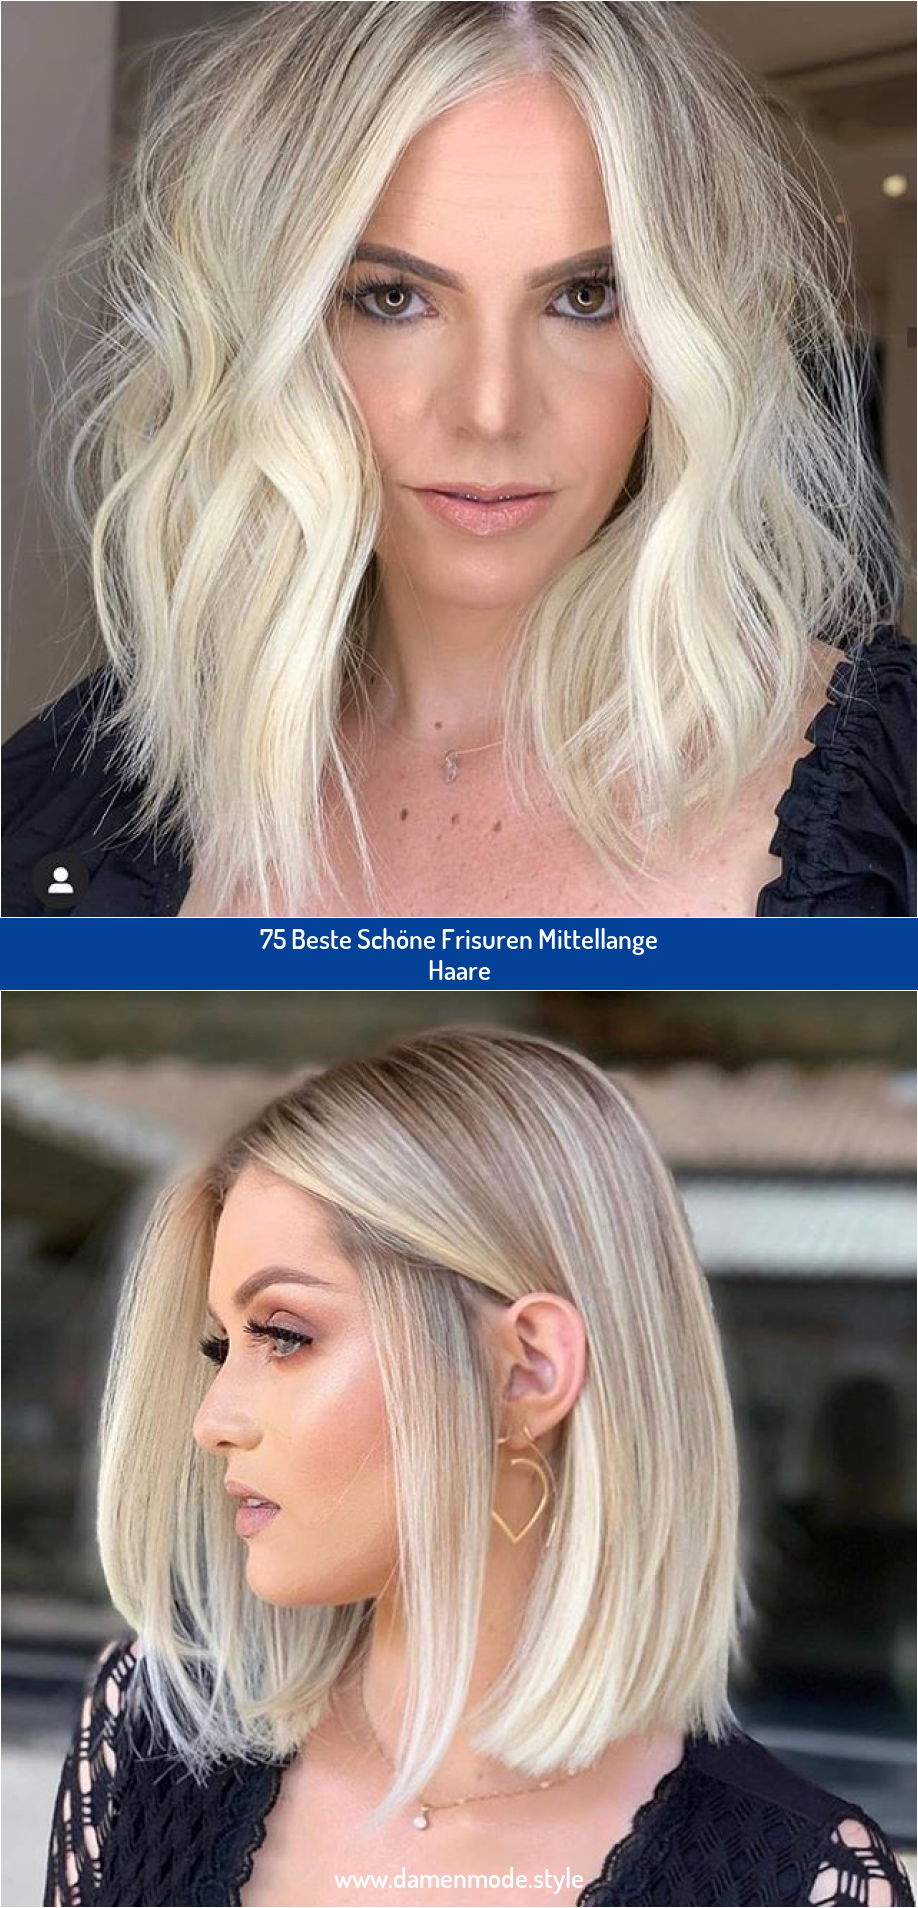 Mode Frisuren In 2020 Bob Frisur Haarschnitt Frisuren Haarschnitte